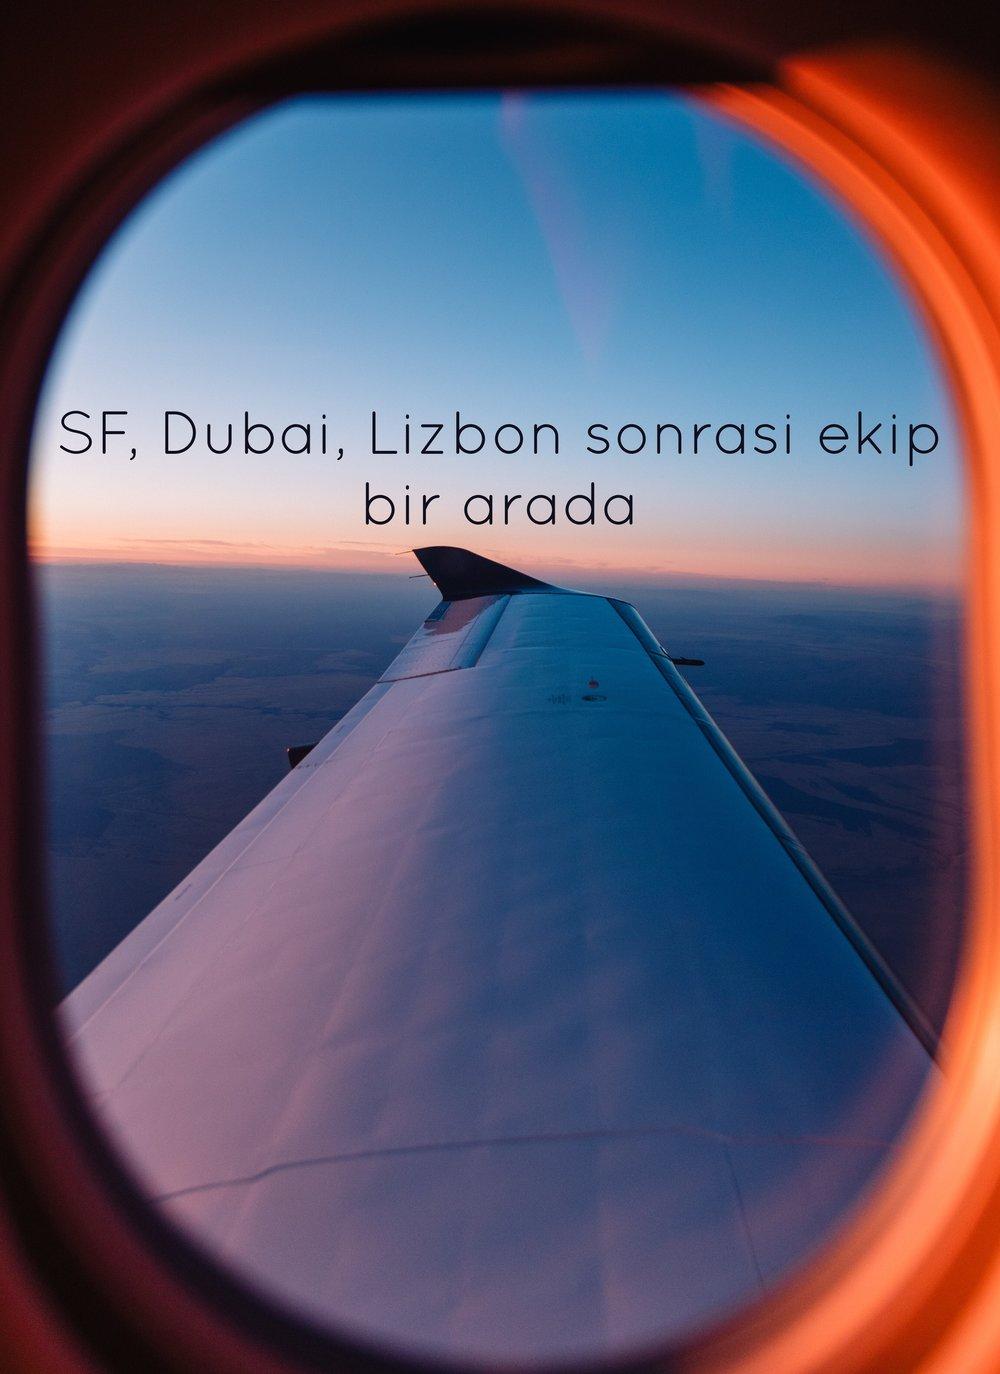 SF-Dubai-Lizbon